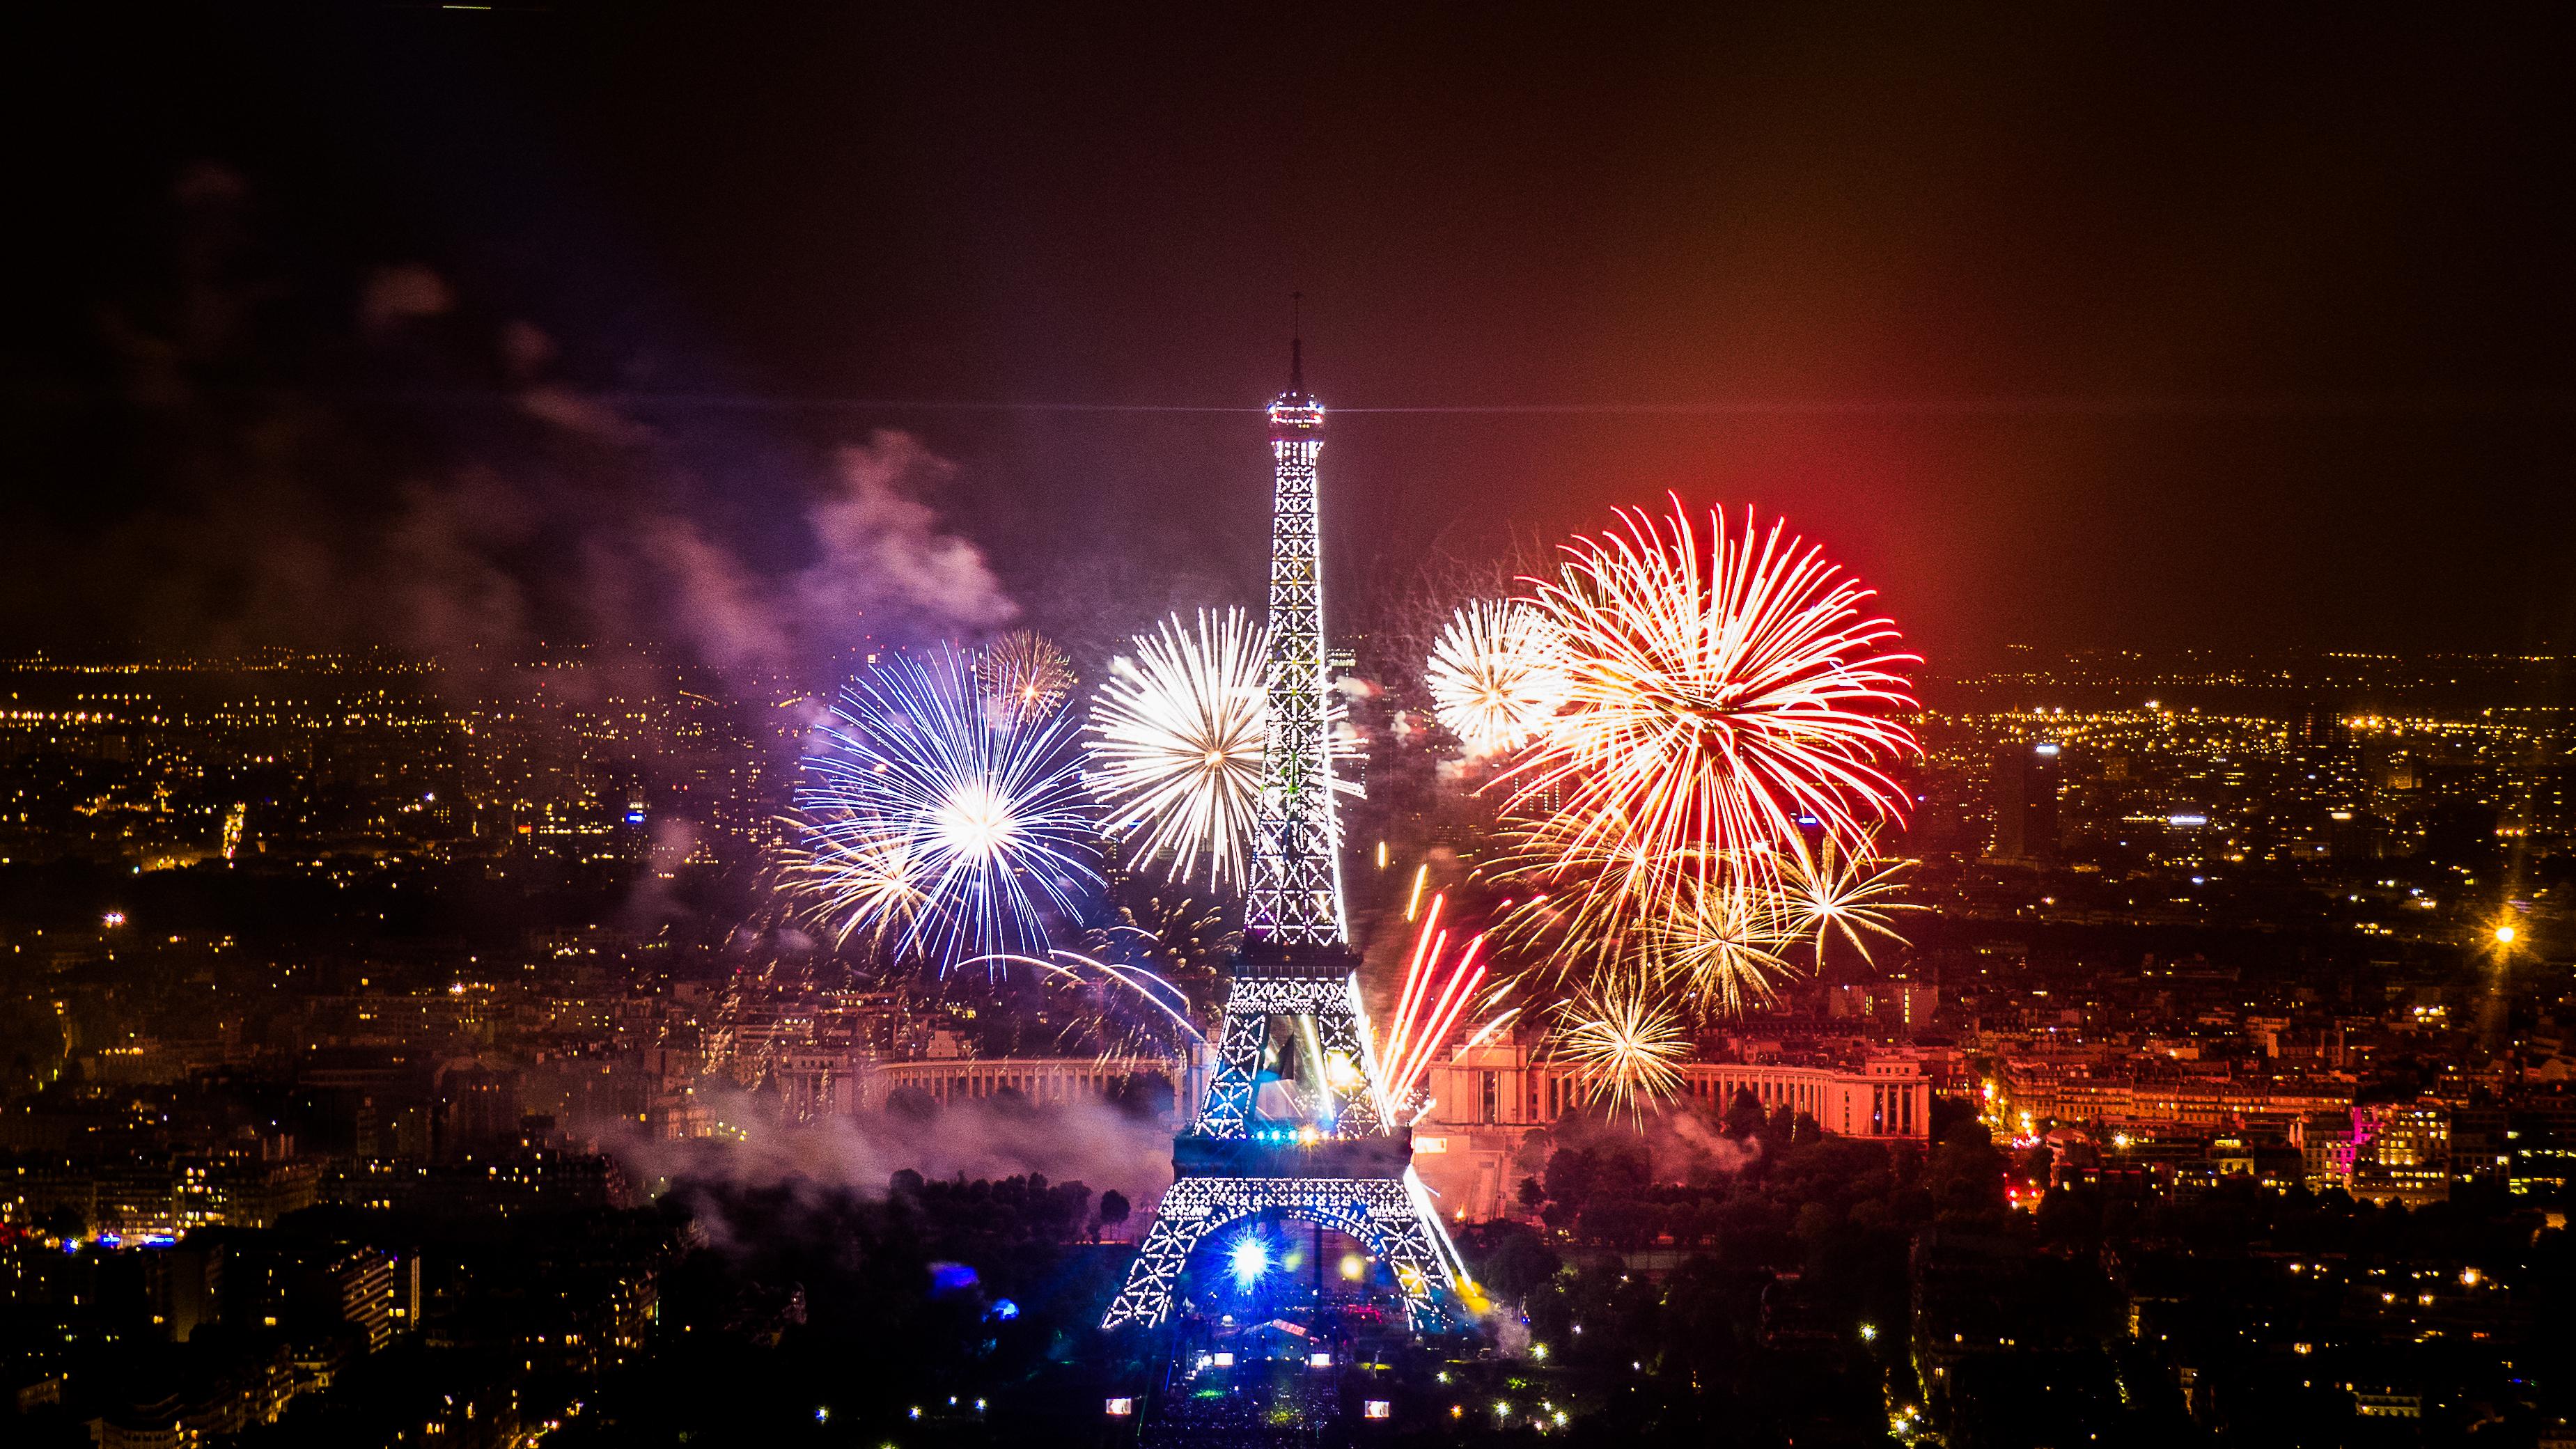 file:2013 fireworks on eiffel tower 10 - wikimedia commons